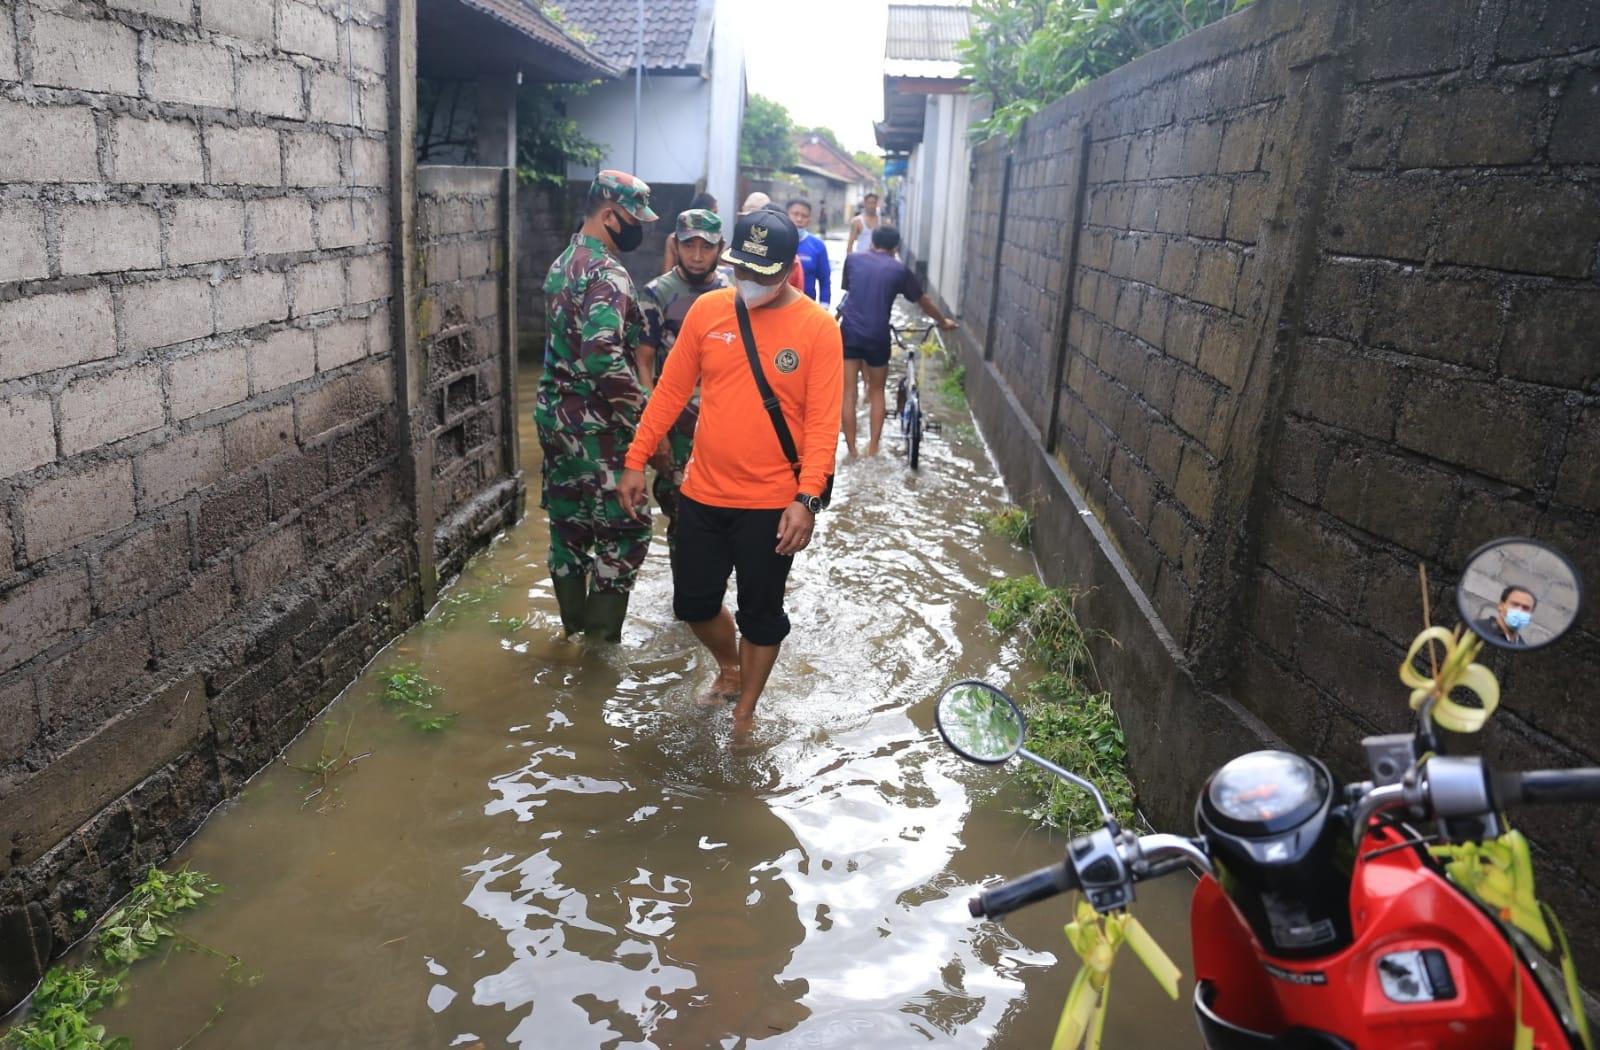 BPBD Klungkung meninjau banjir di Bantaran Sungai Candigara, Banjar Pancingan, Desa Kusamba, Kecamatan Dawan, Minggu (12/9/2021). Foto: ist